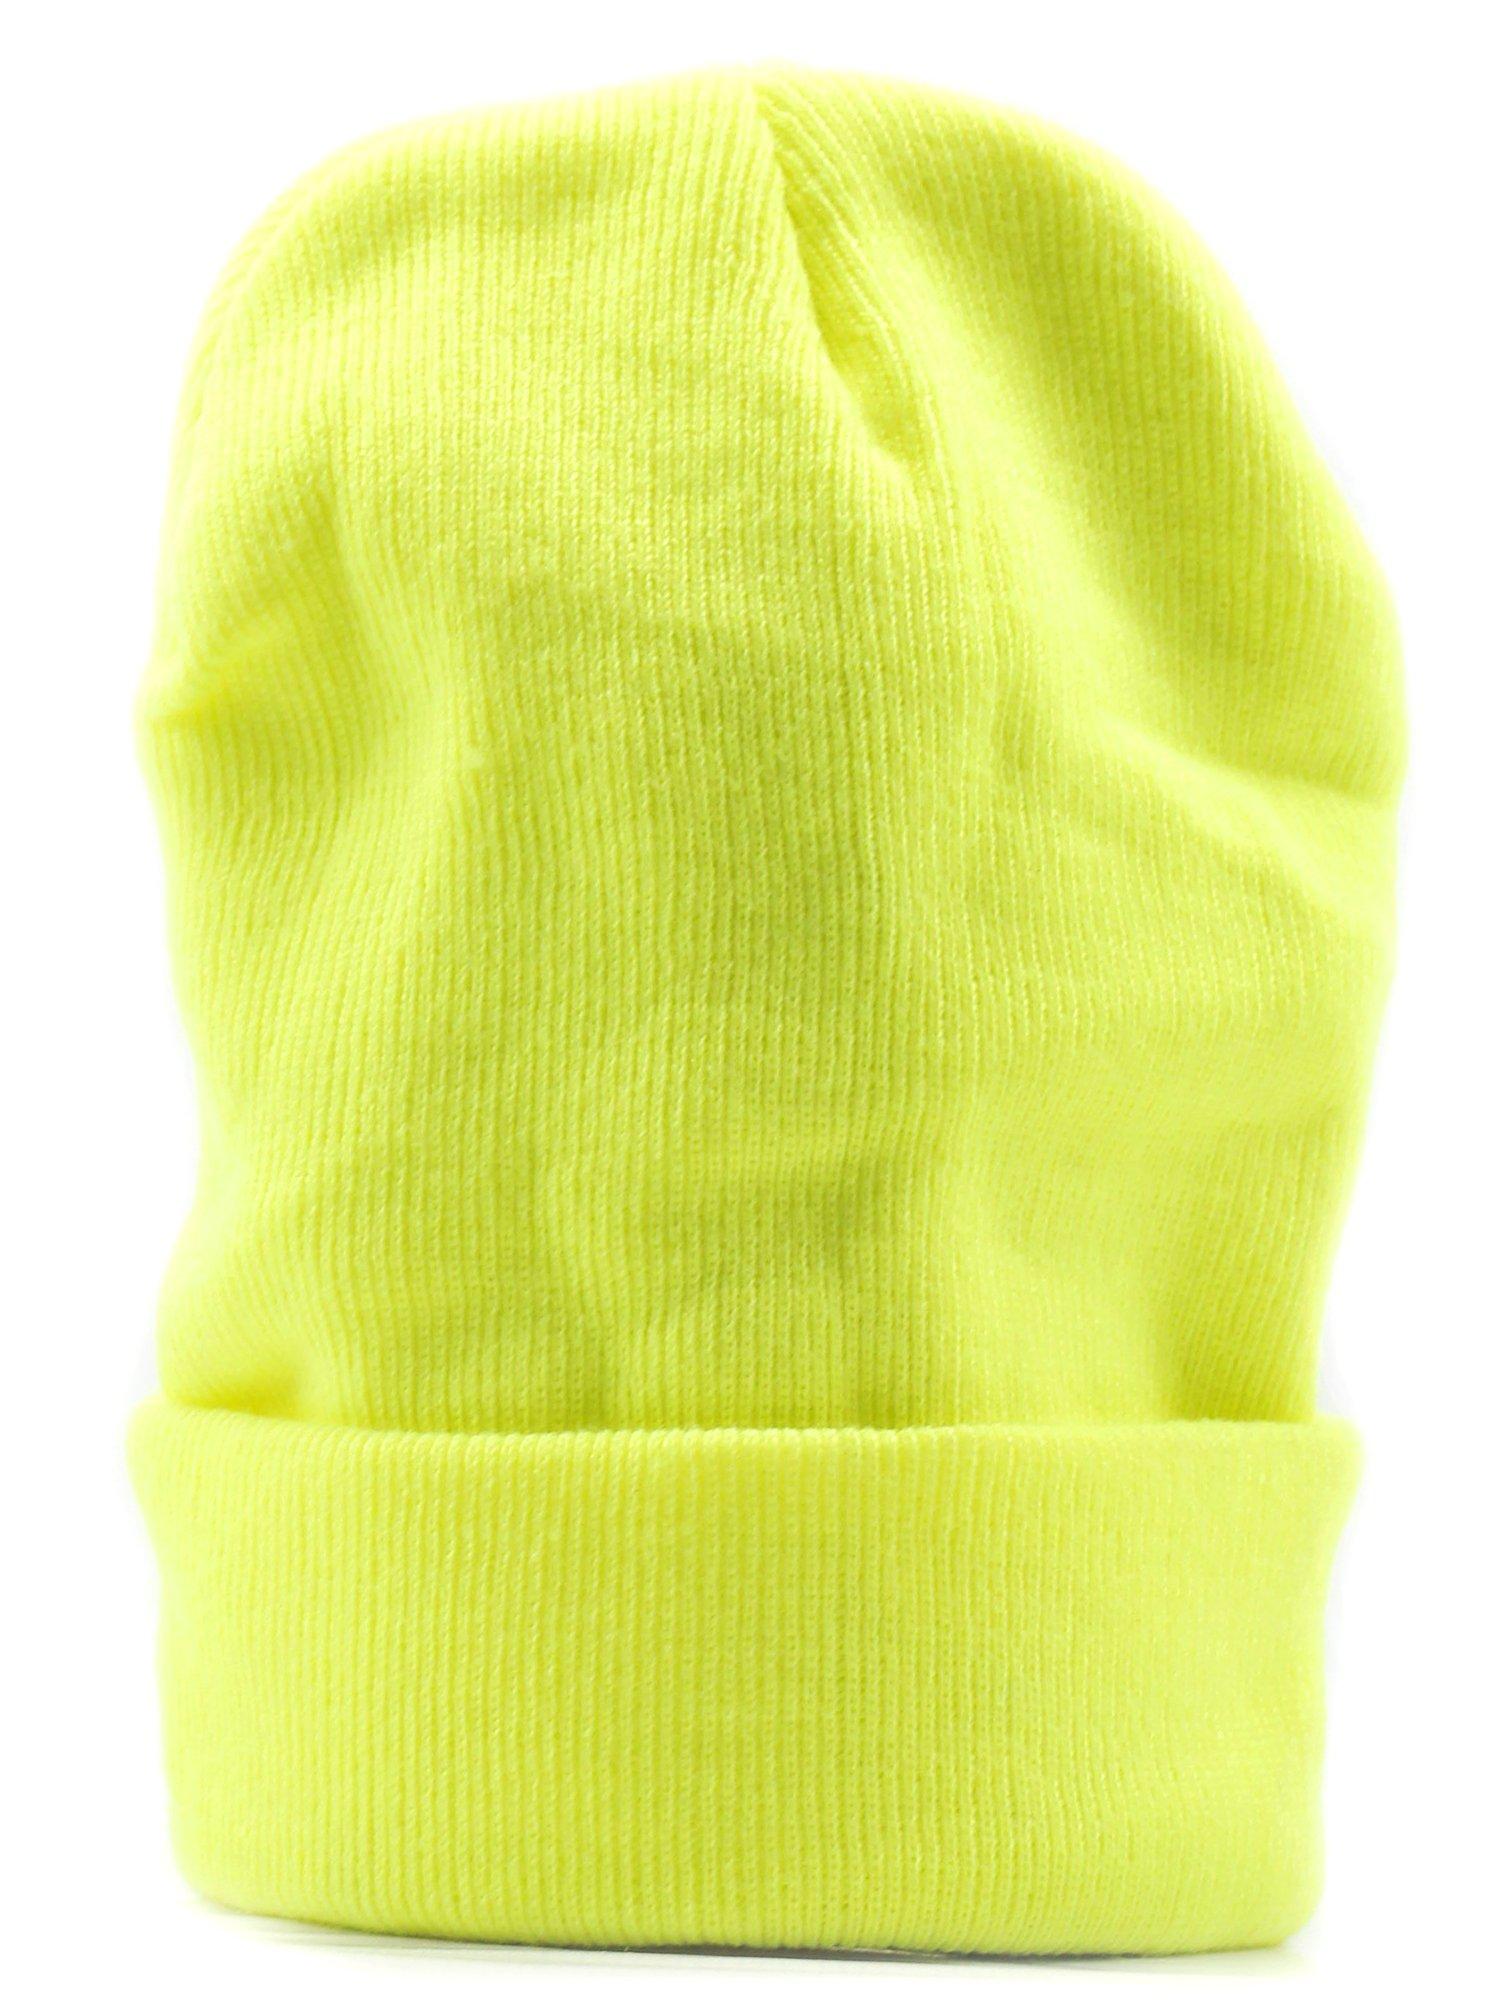 Wasserfarm - Cuffia in lana da snowboard 56/1, colore fluo